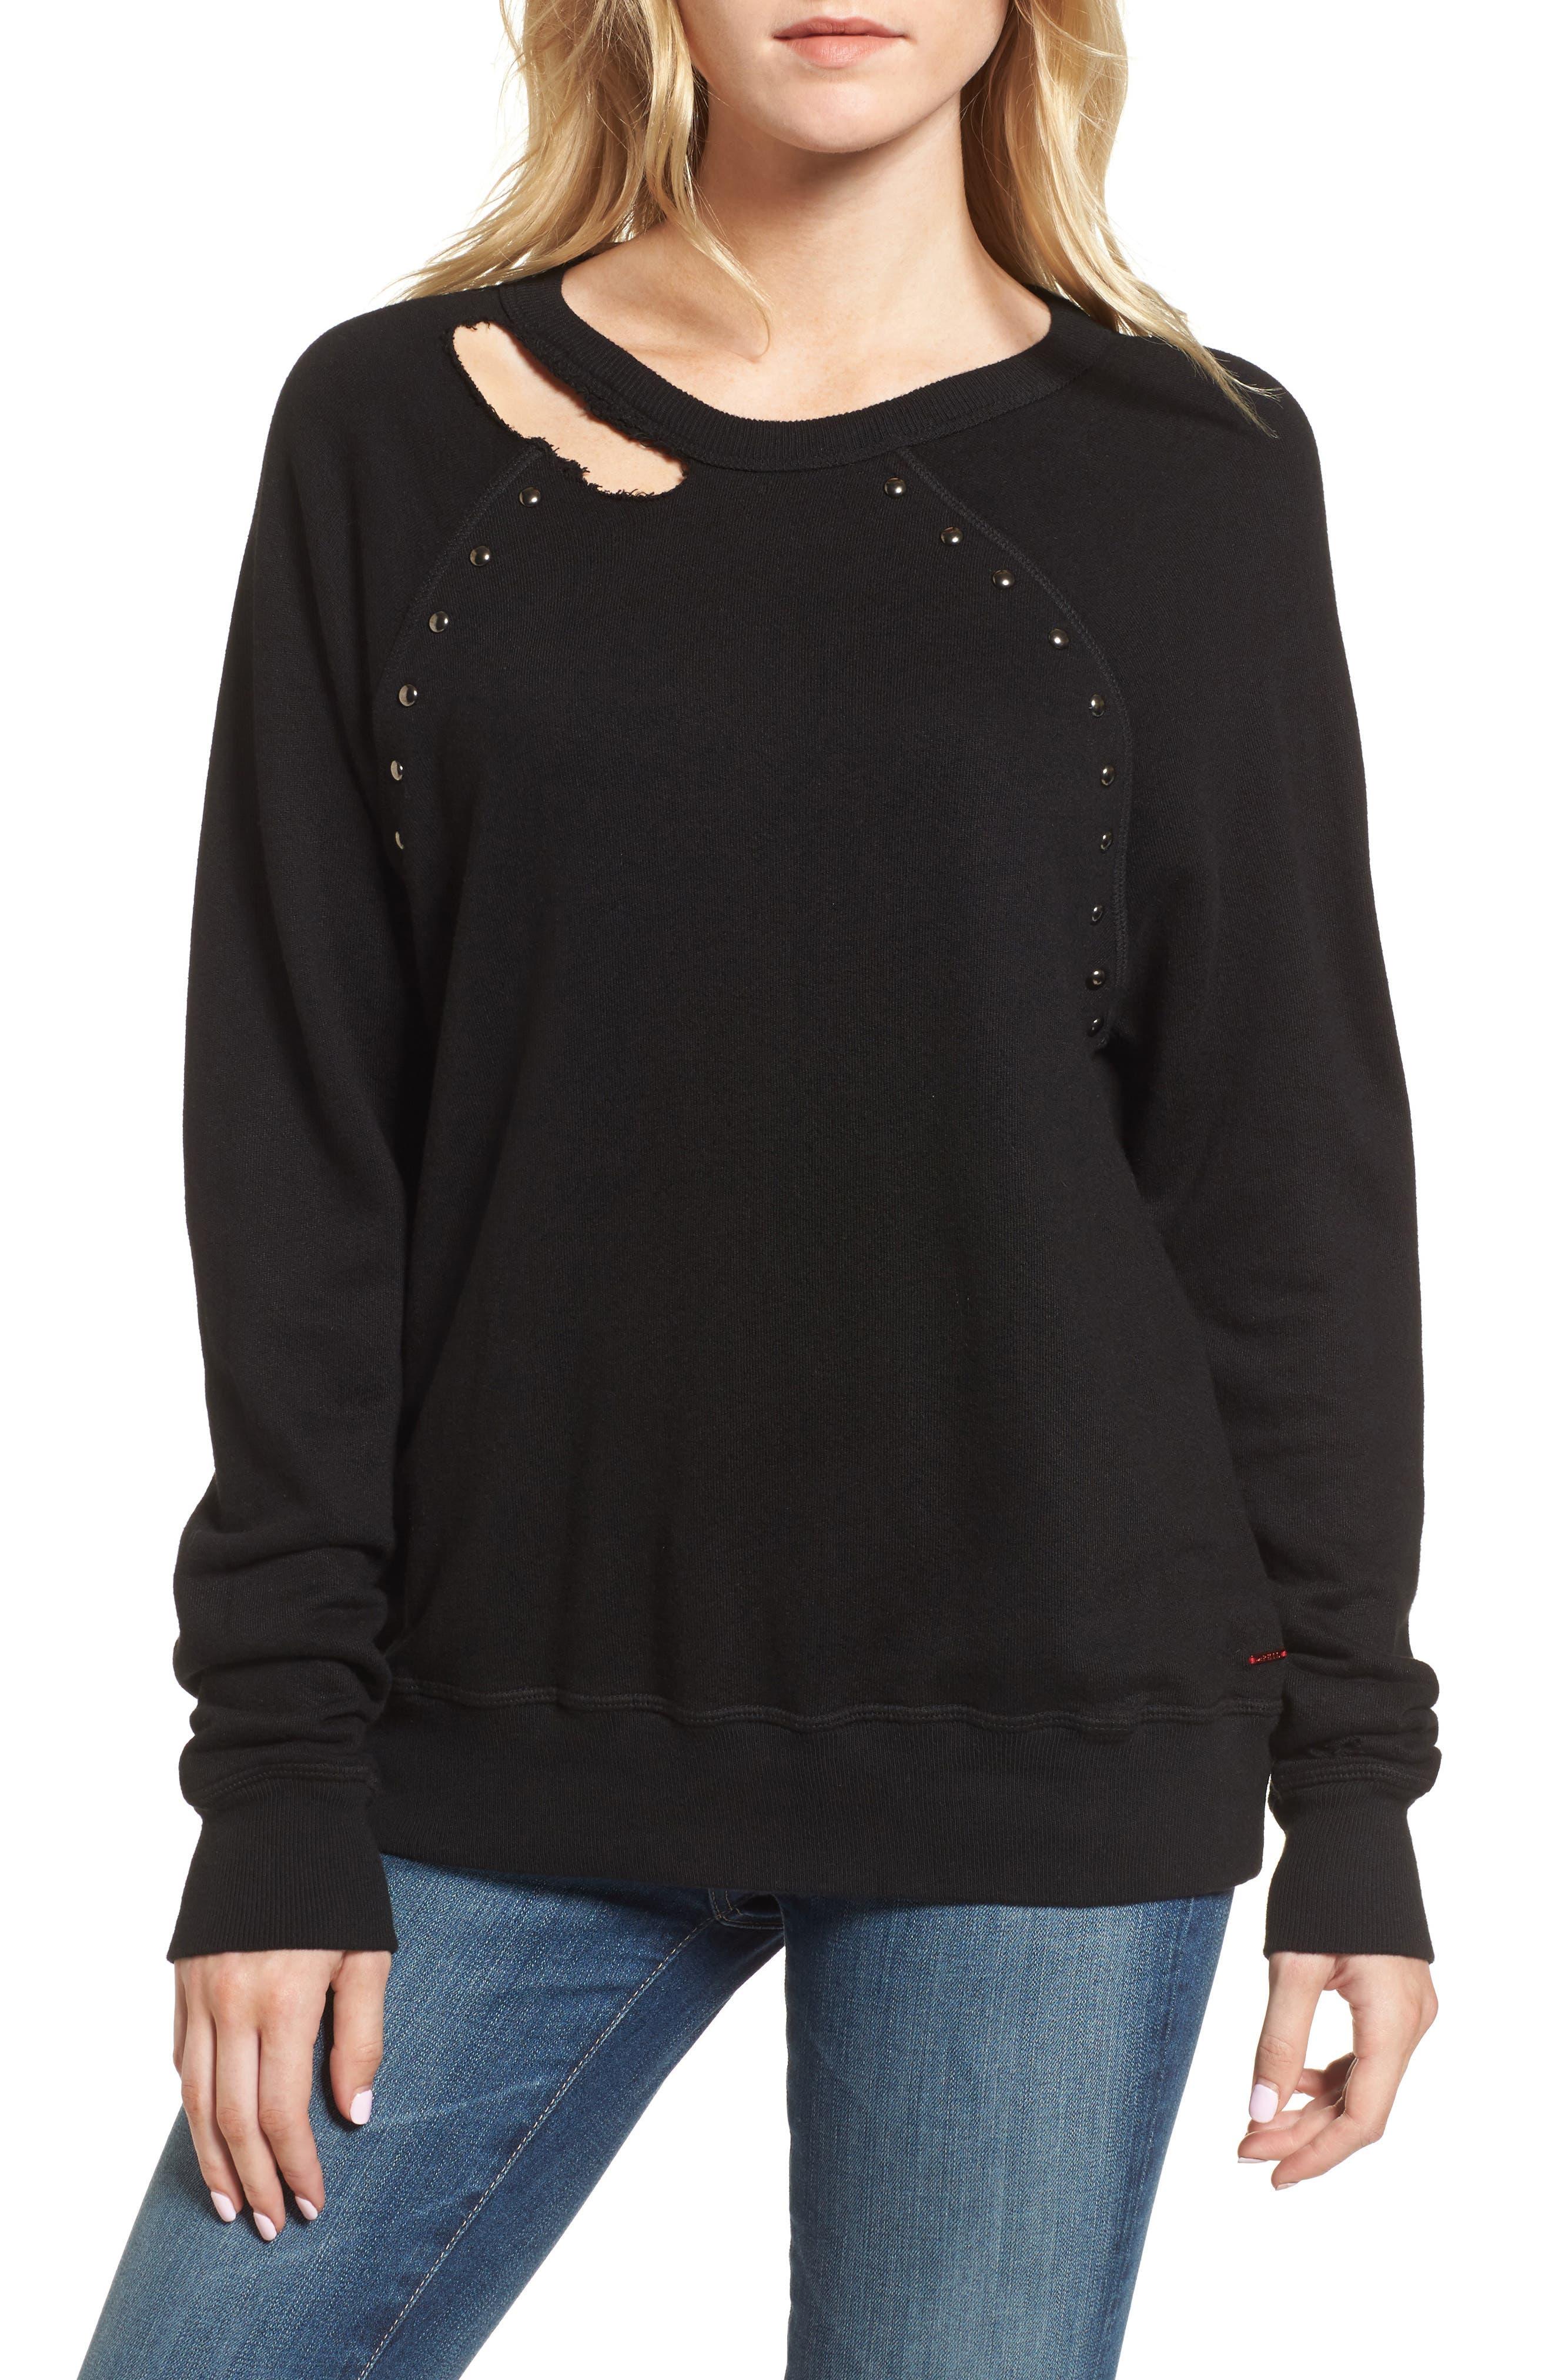 Main Image - n:PHILANTHROPY Nic Studded Sweatshirt